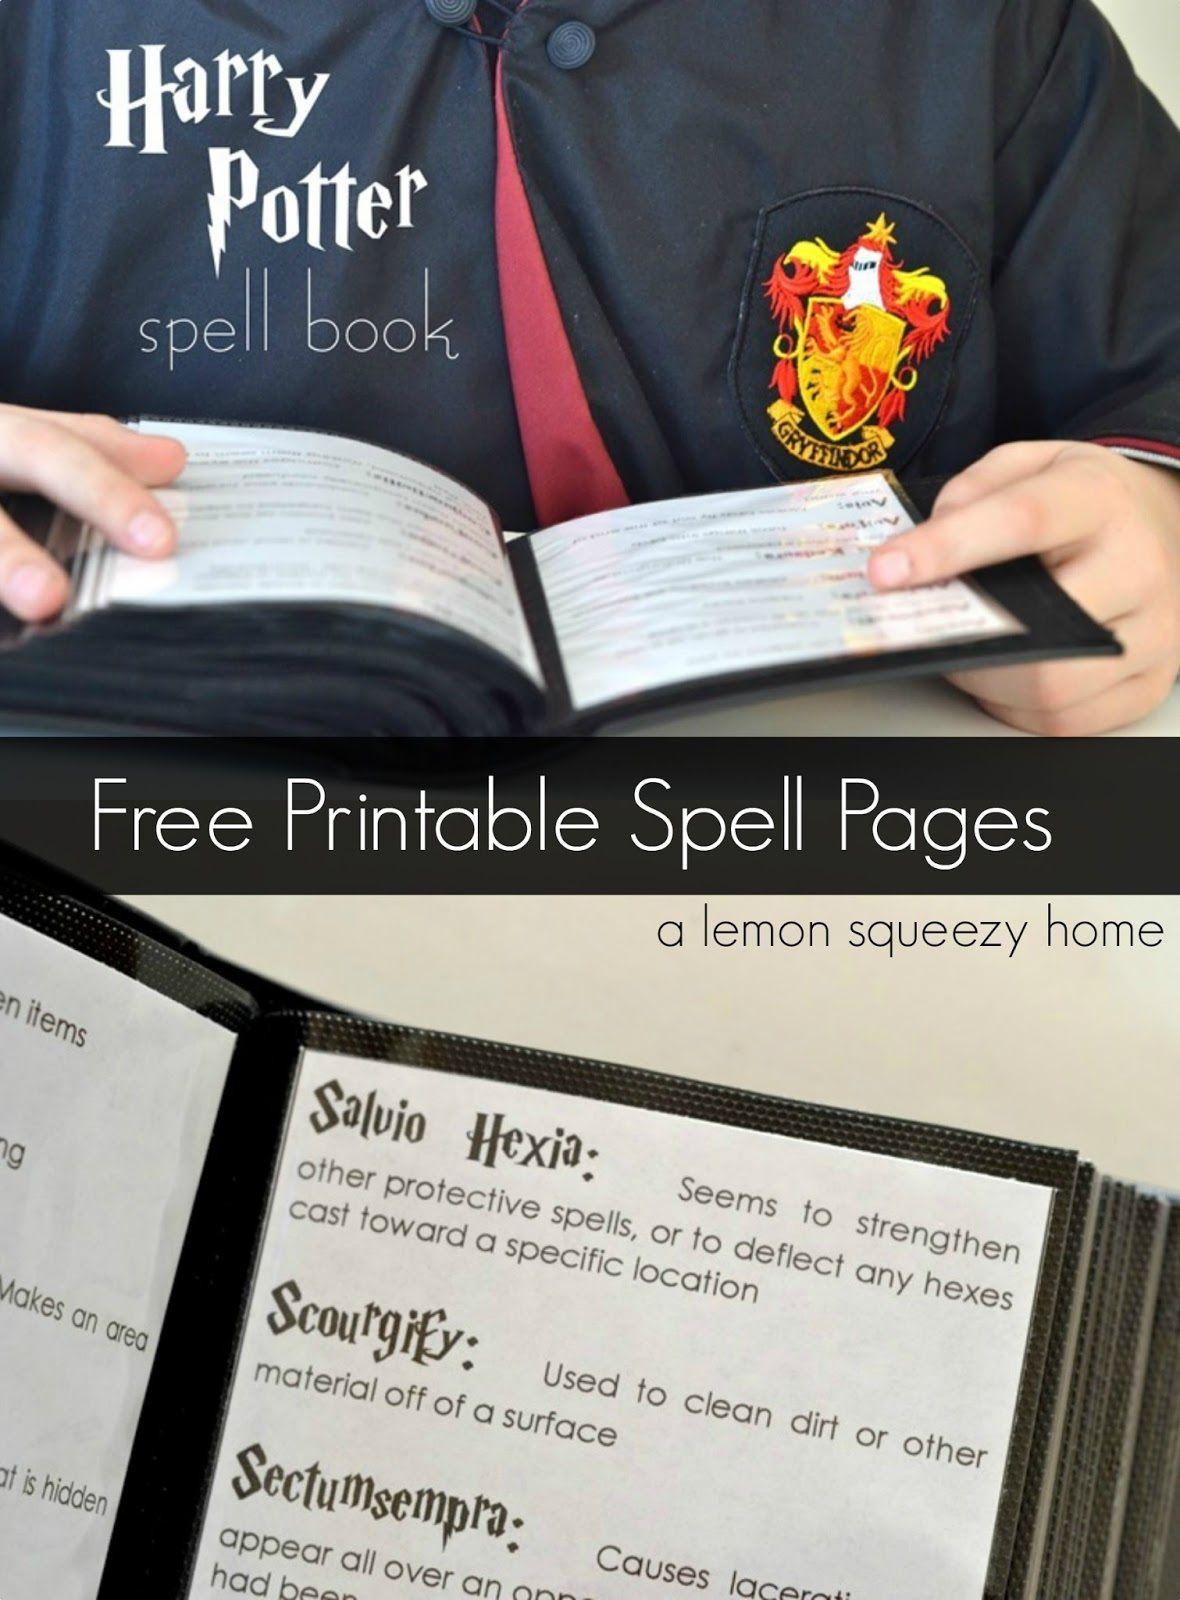 Harry Potter Spell Book Printable Spells